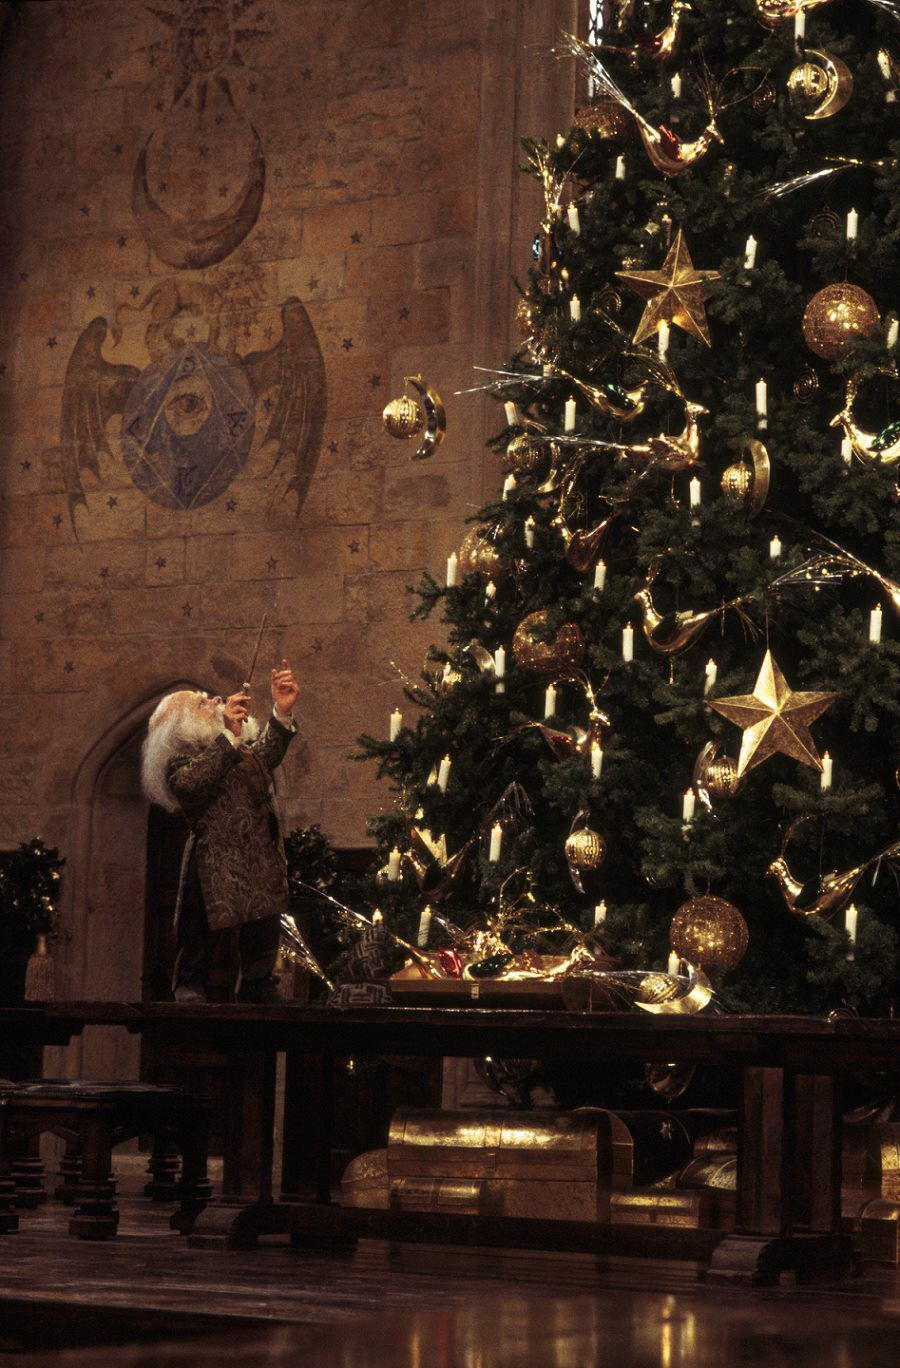 Harry Potter Christmas Wallpaper Hd.Harry Potter Christmas Tree Wallpapers Top Free Harry